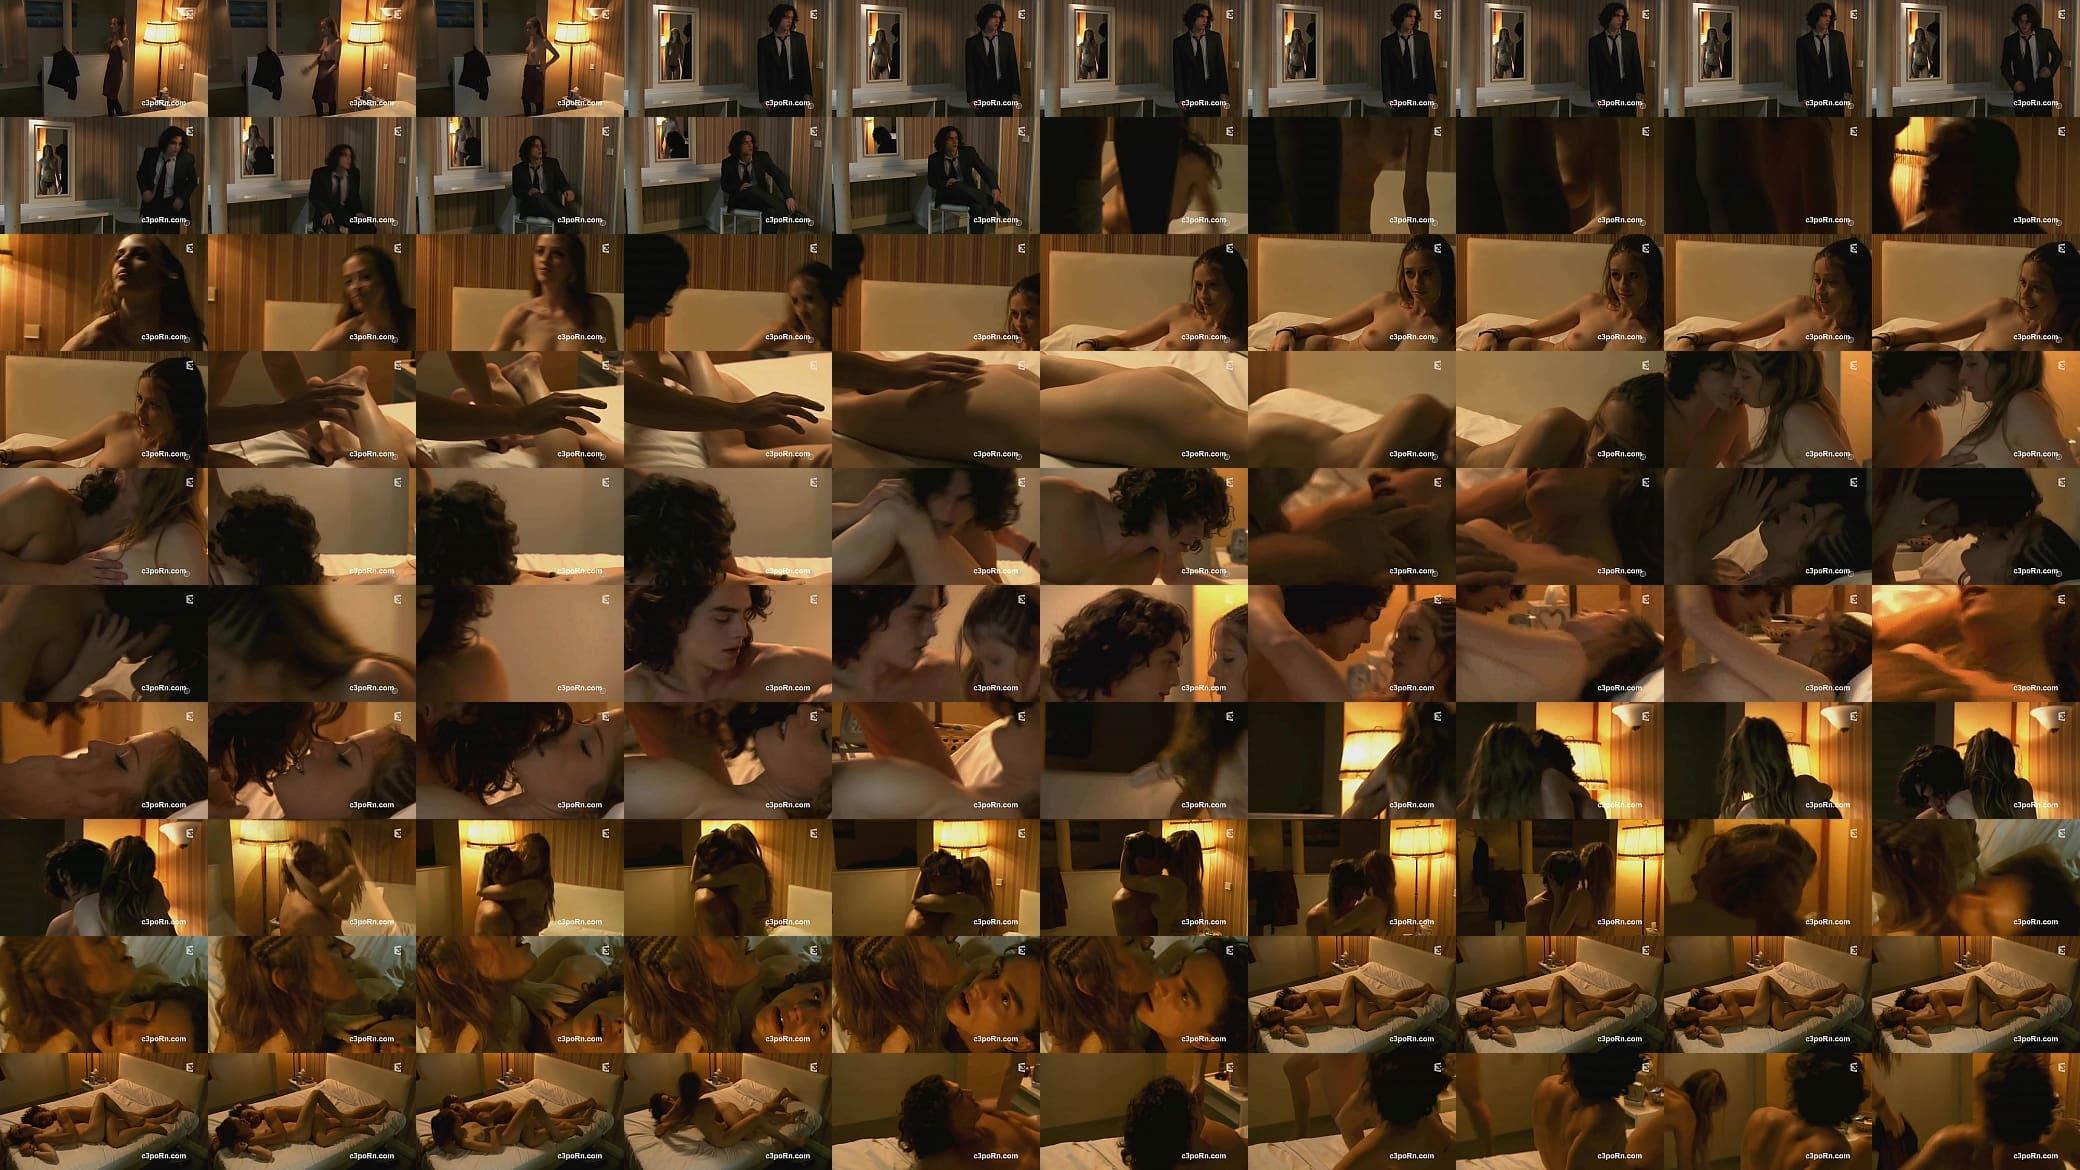 Vicki Li Hottest Moments Compilation pictures